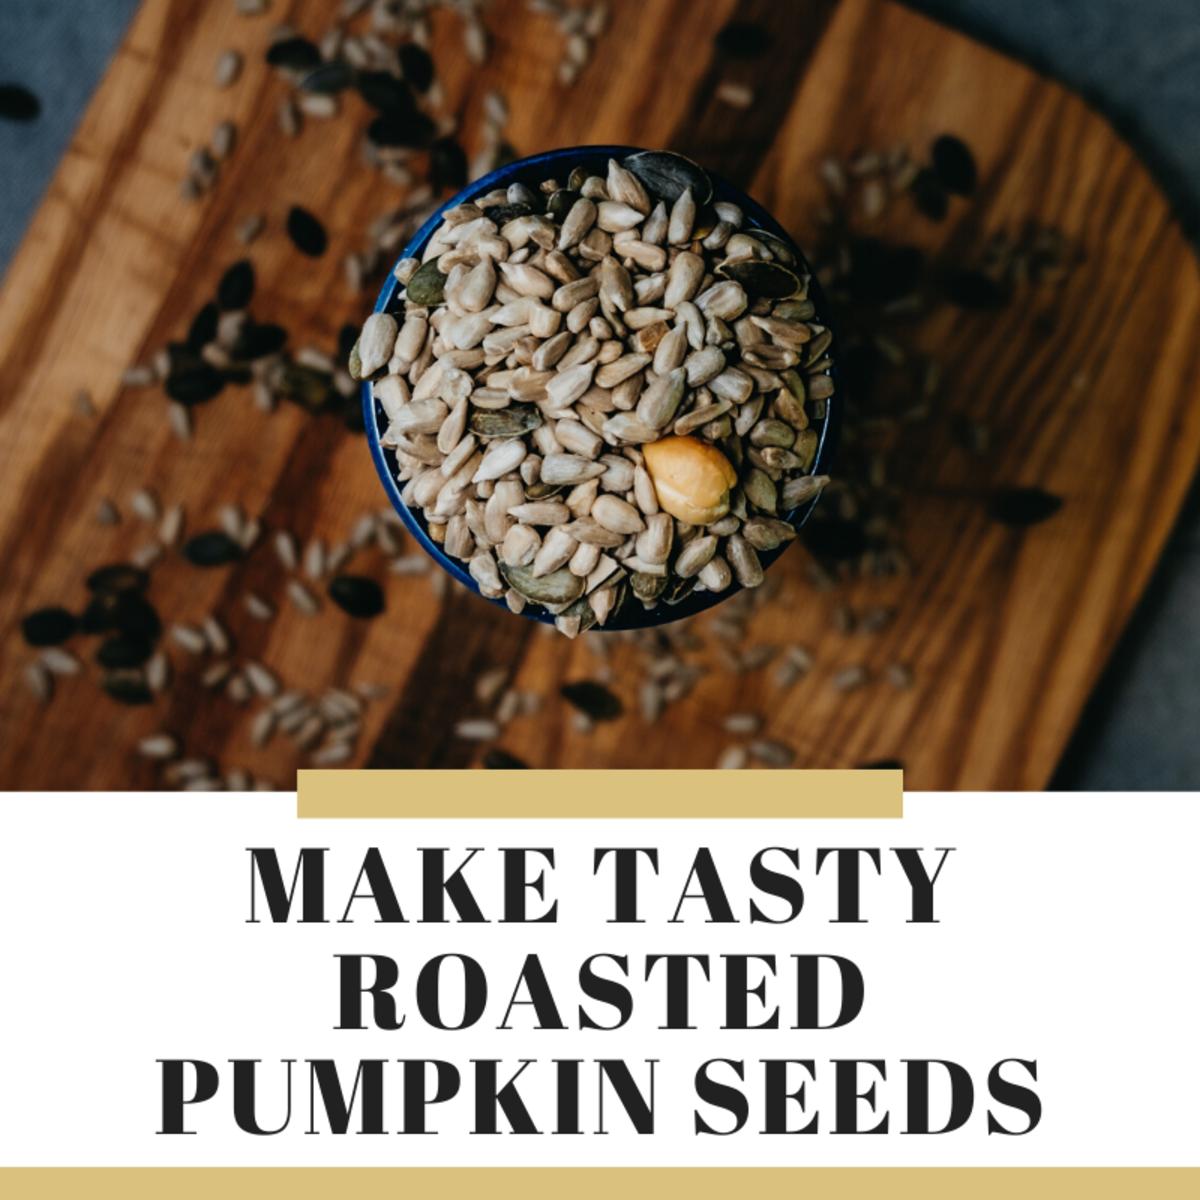 How to Make Tasty Roasted Pumpkin Seeds